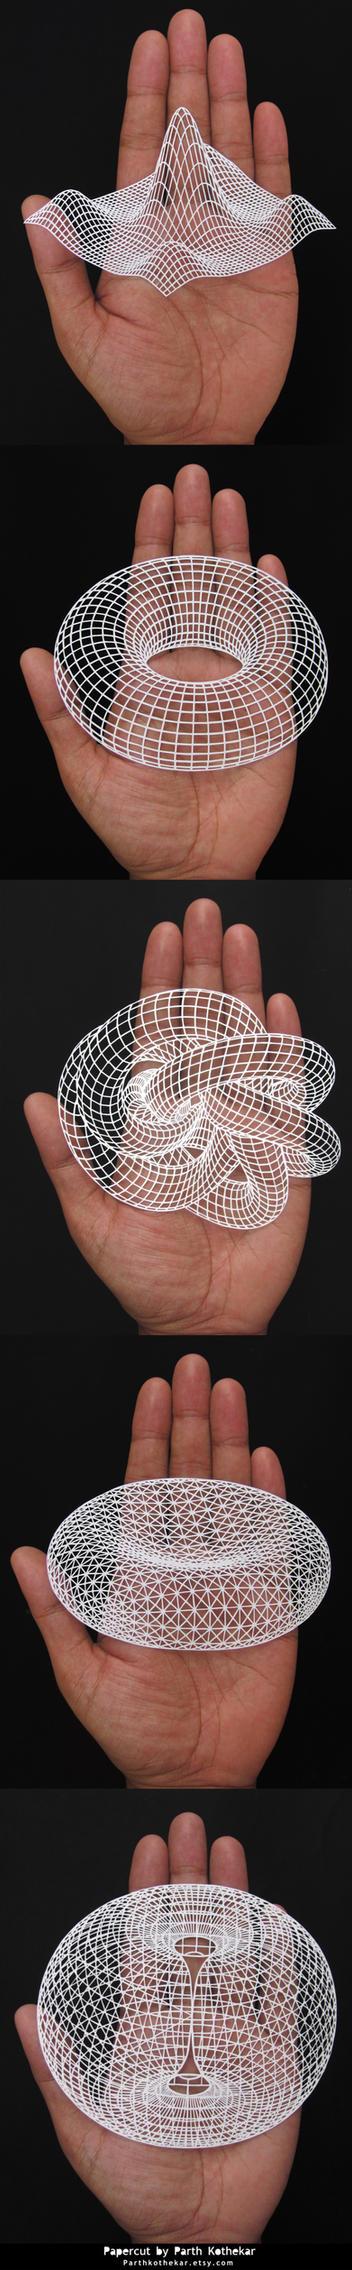 Papercut - 3d - geometric - paper art - papercuts